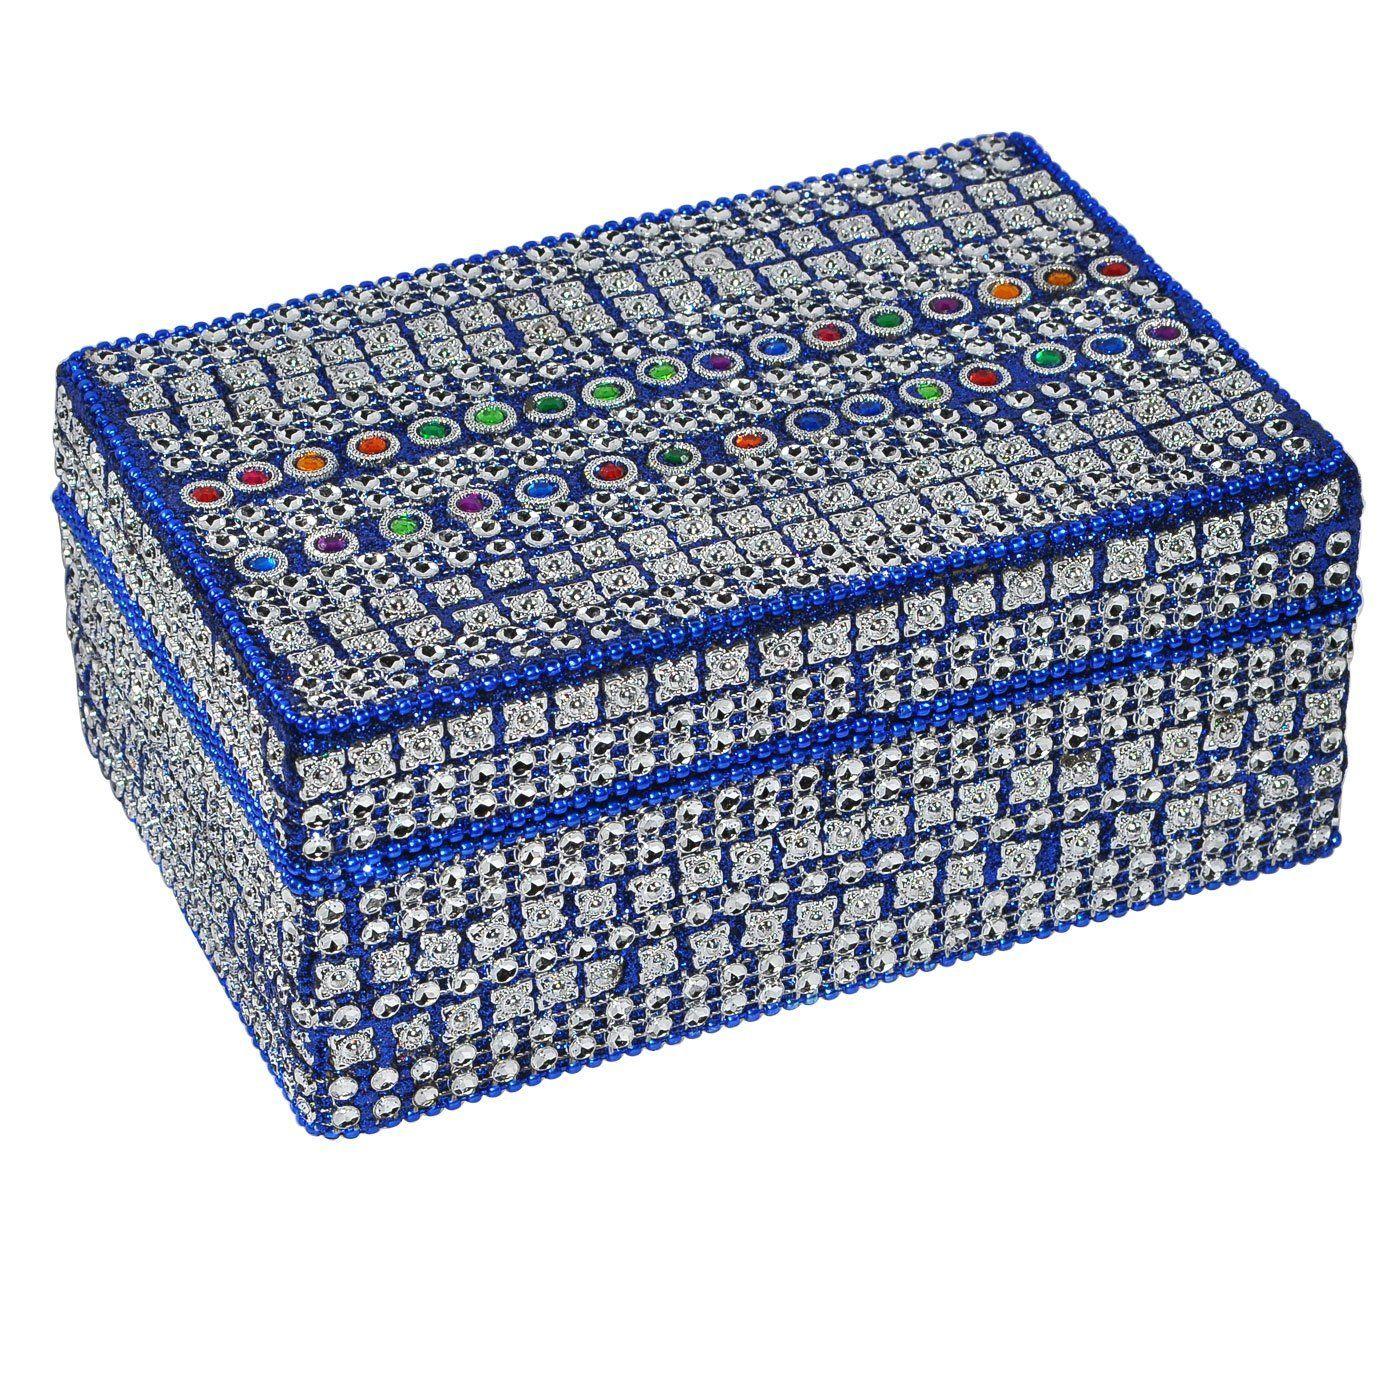 Decorative Boxes Uk Best Gift Idea Blue Decorative Jewelry Box Amazoncouk Kitchen